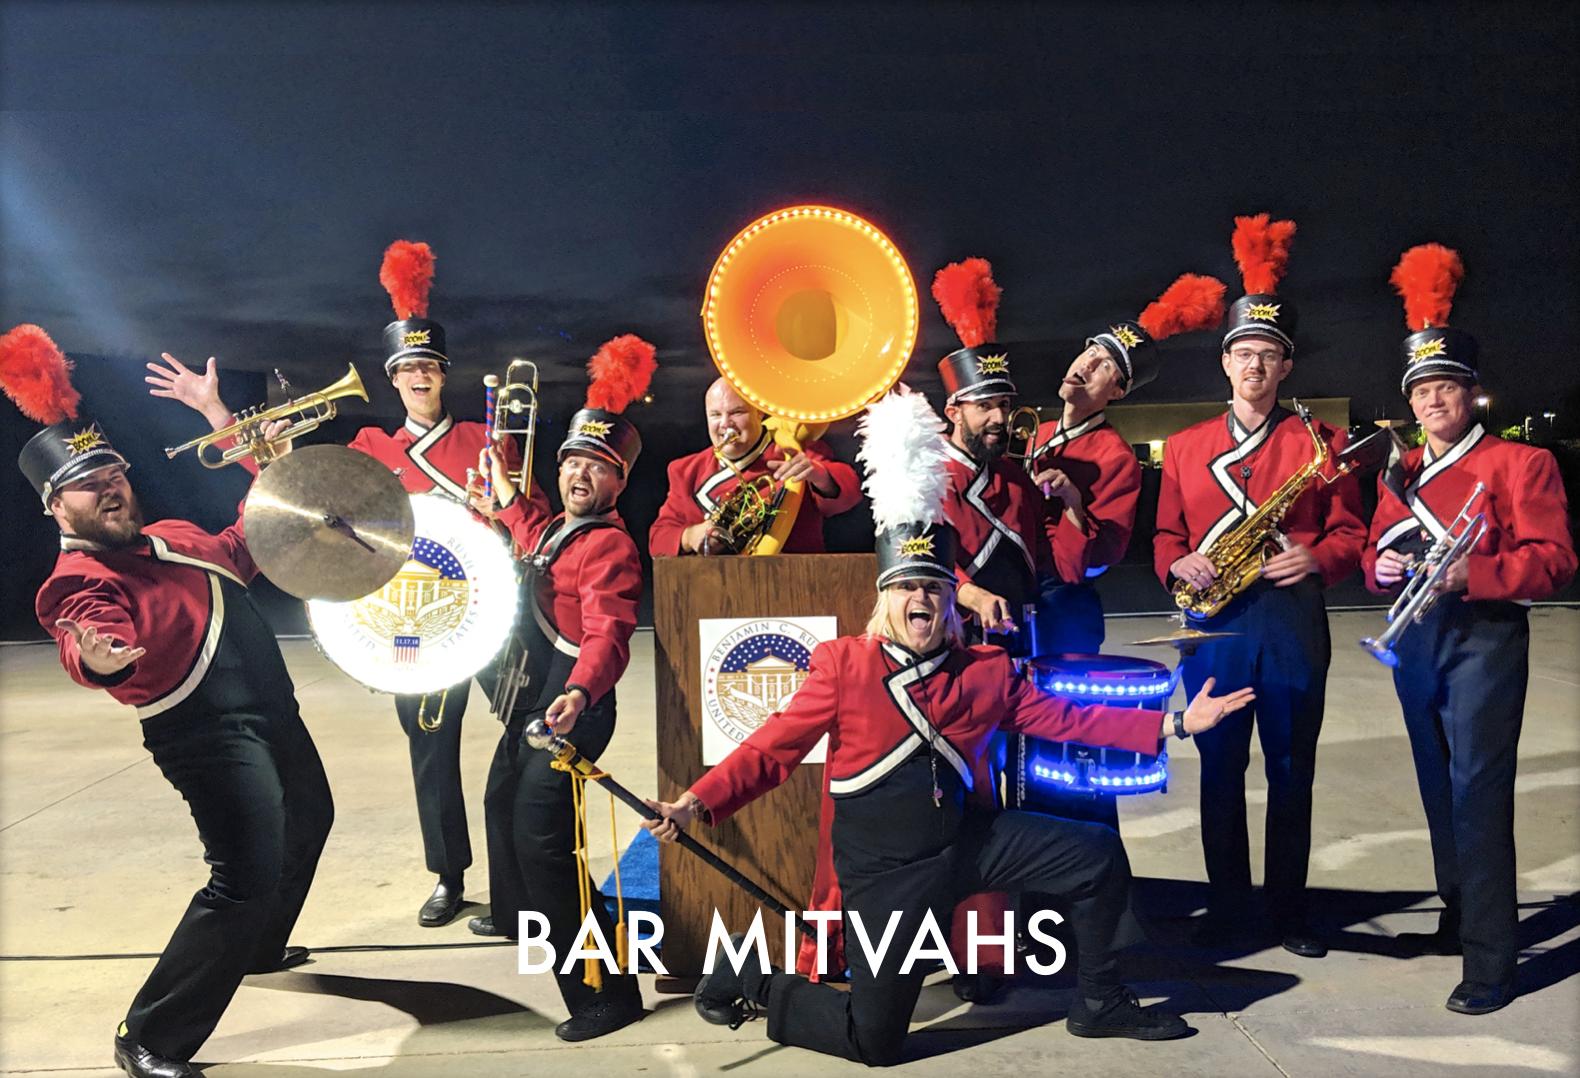 Bar Mitzvahs